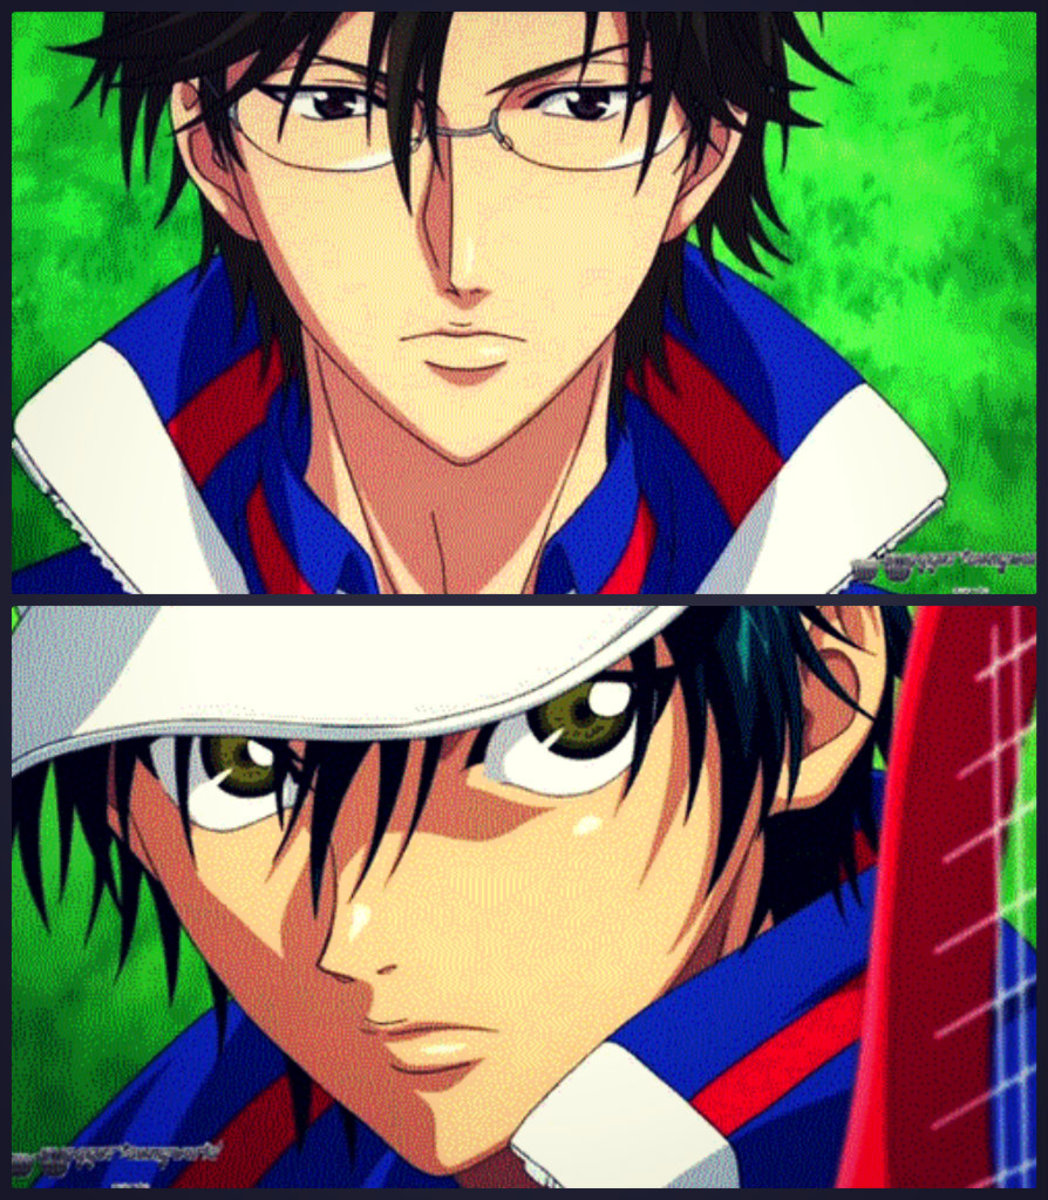 Kunimitsu Tezuka and Echizen Ryoma (Prince of Tennis)